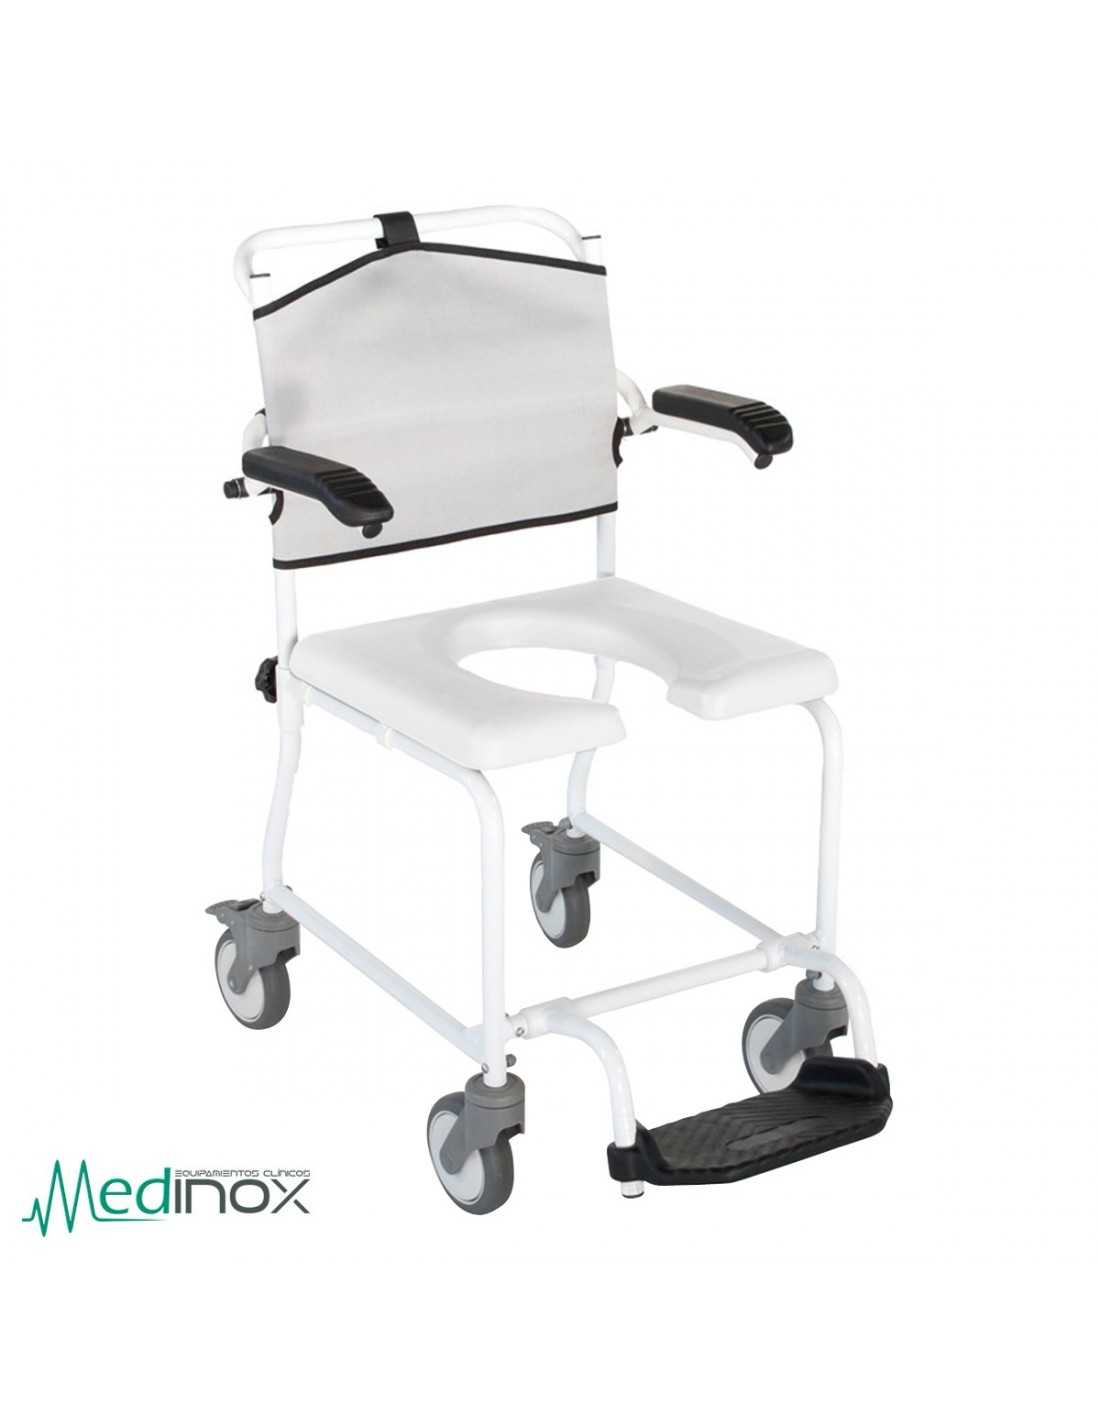 Silla para ducha con ruedas ayad809 silla ba o con ruedas resistente - Silla de bano con ruedas ...